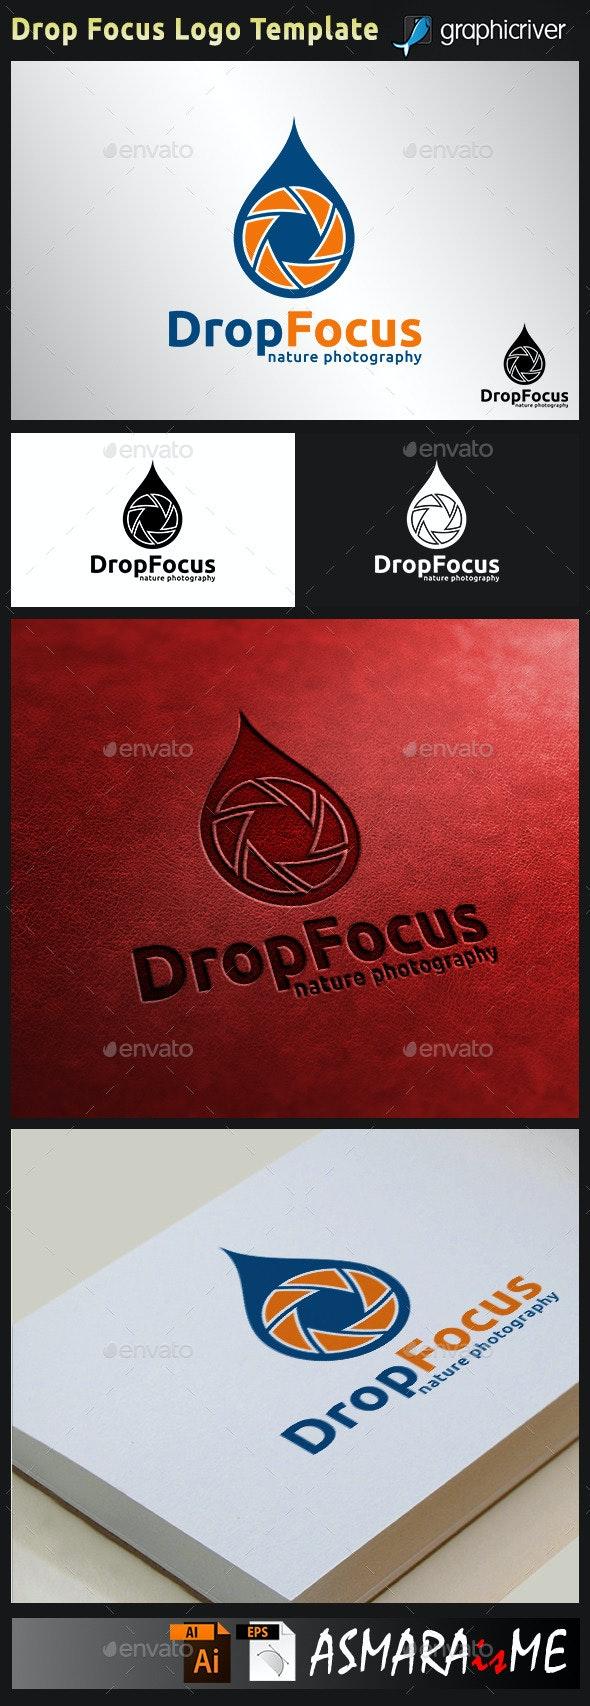 Camera Logo - Drop Focus - Shot Point Photography  - Symbols Logo Templates